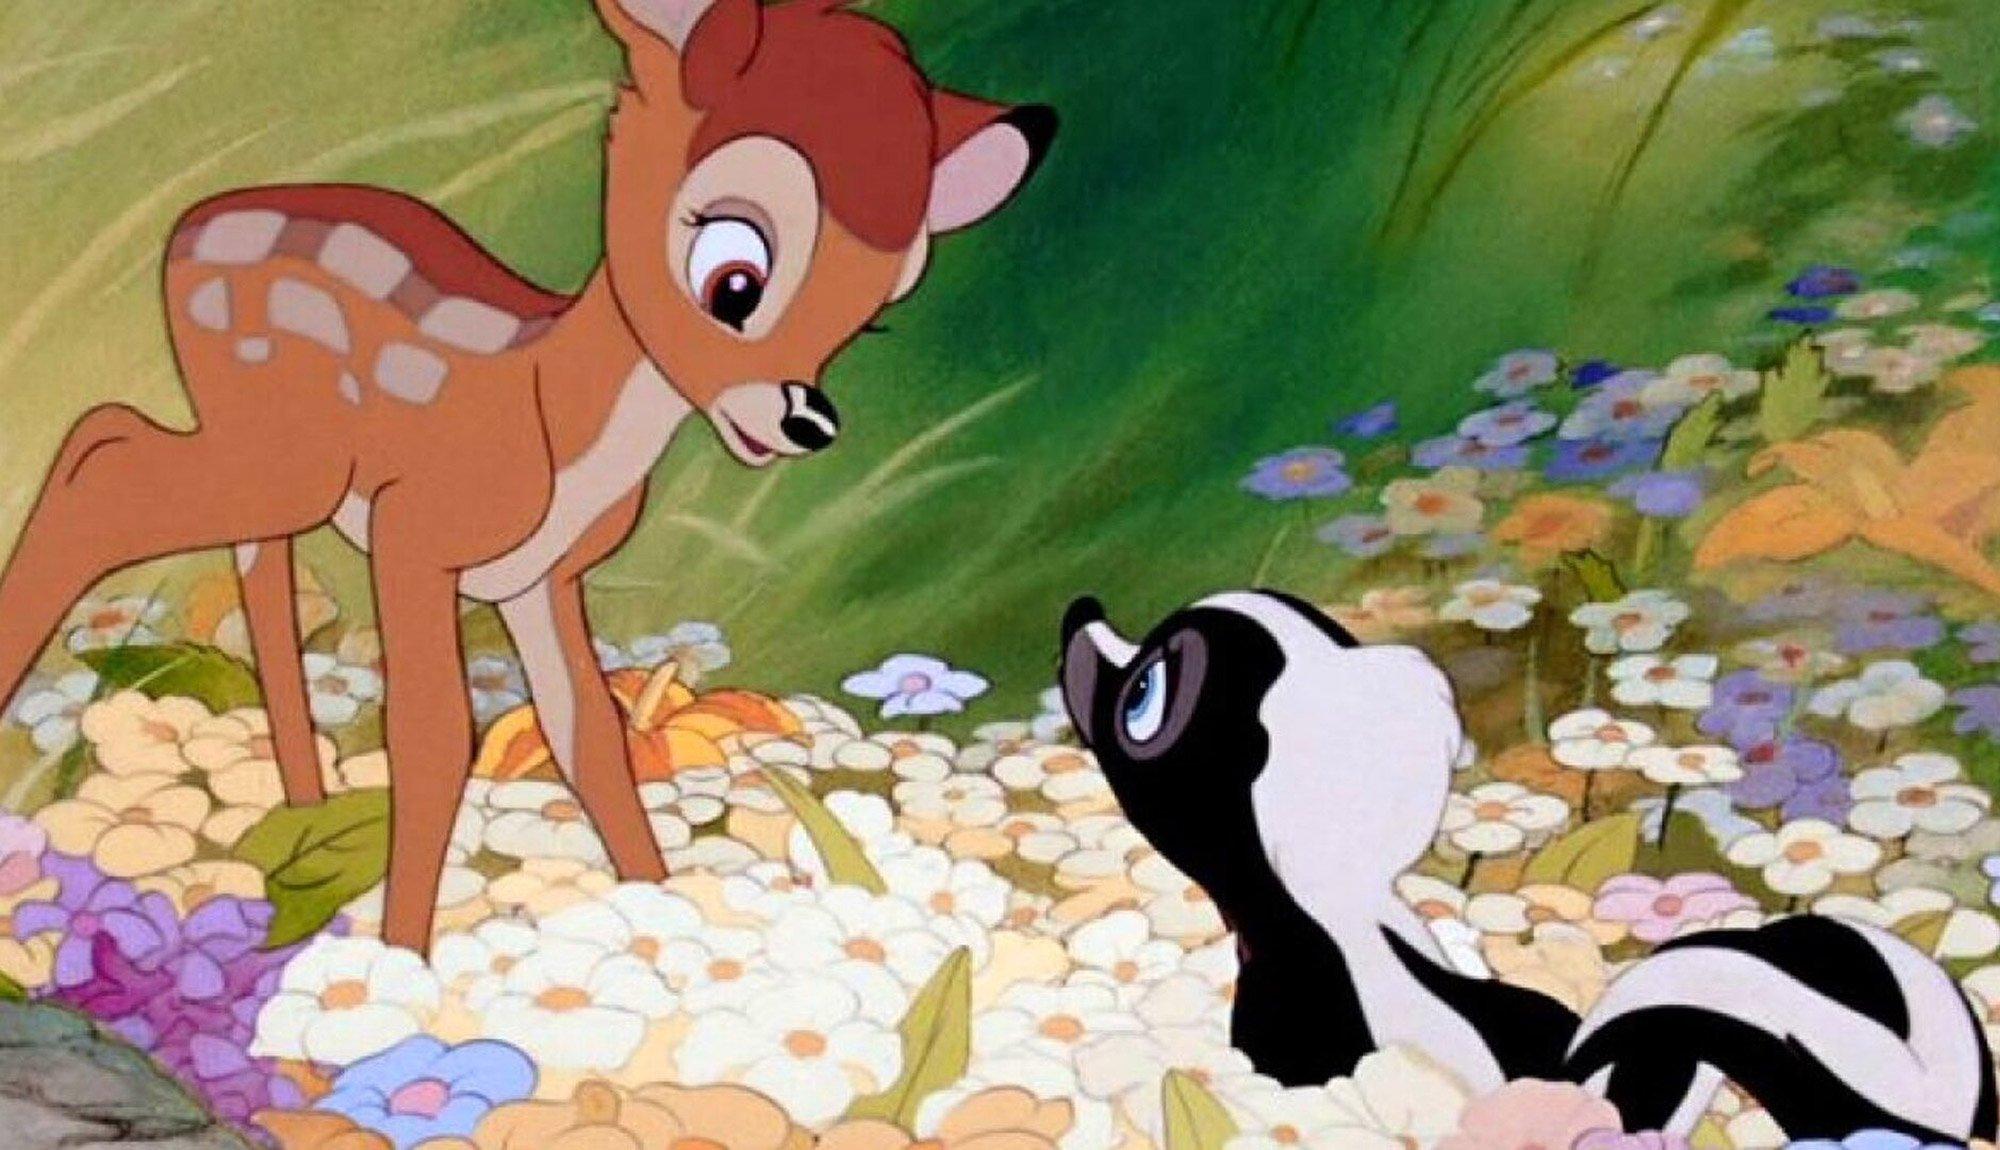 Bambi Change Hunting and Eating Habits